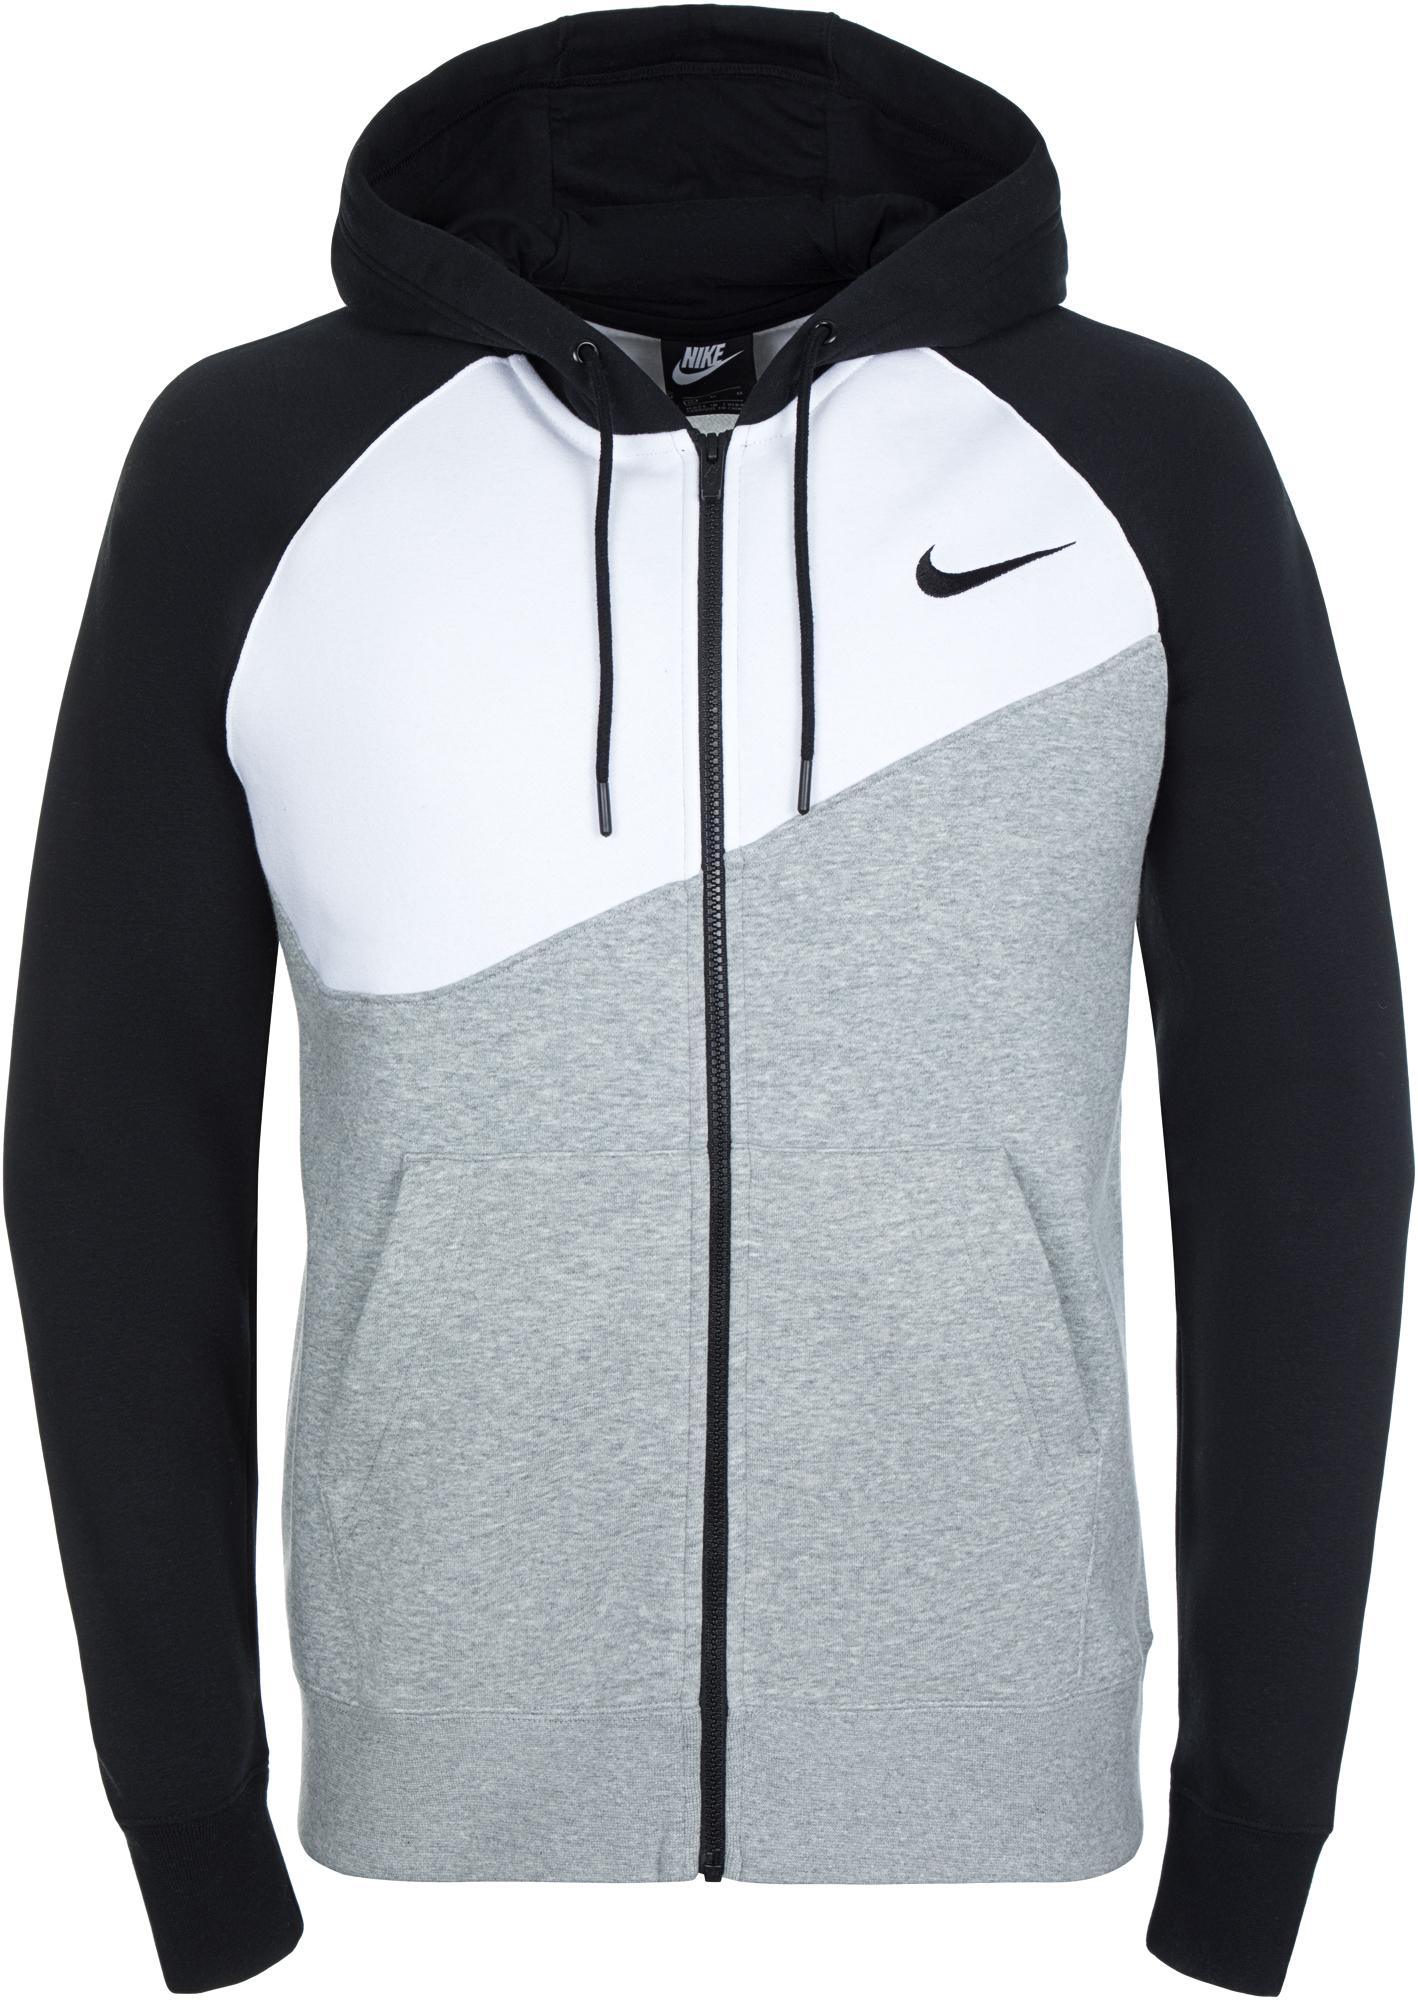 Фото Nike Толстовка мужская Nike Swoosh, размер 52-54